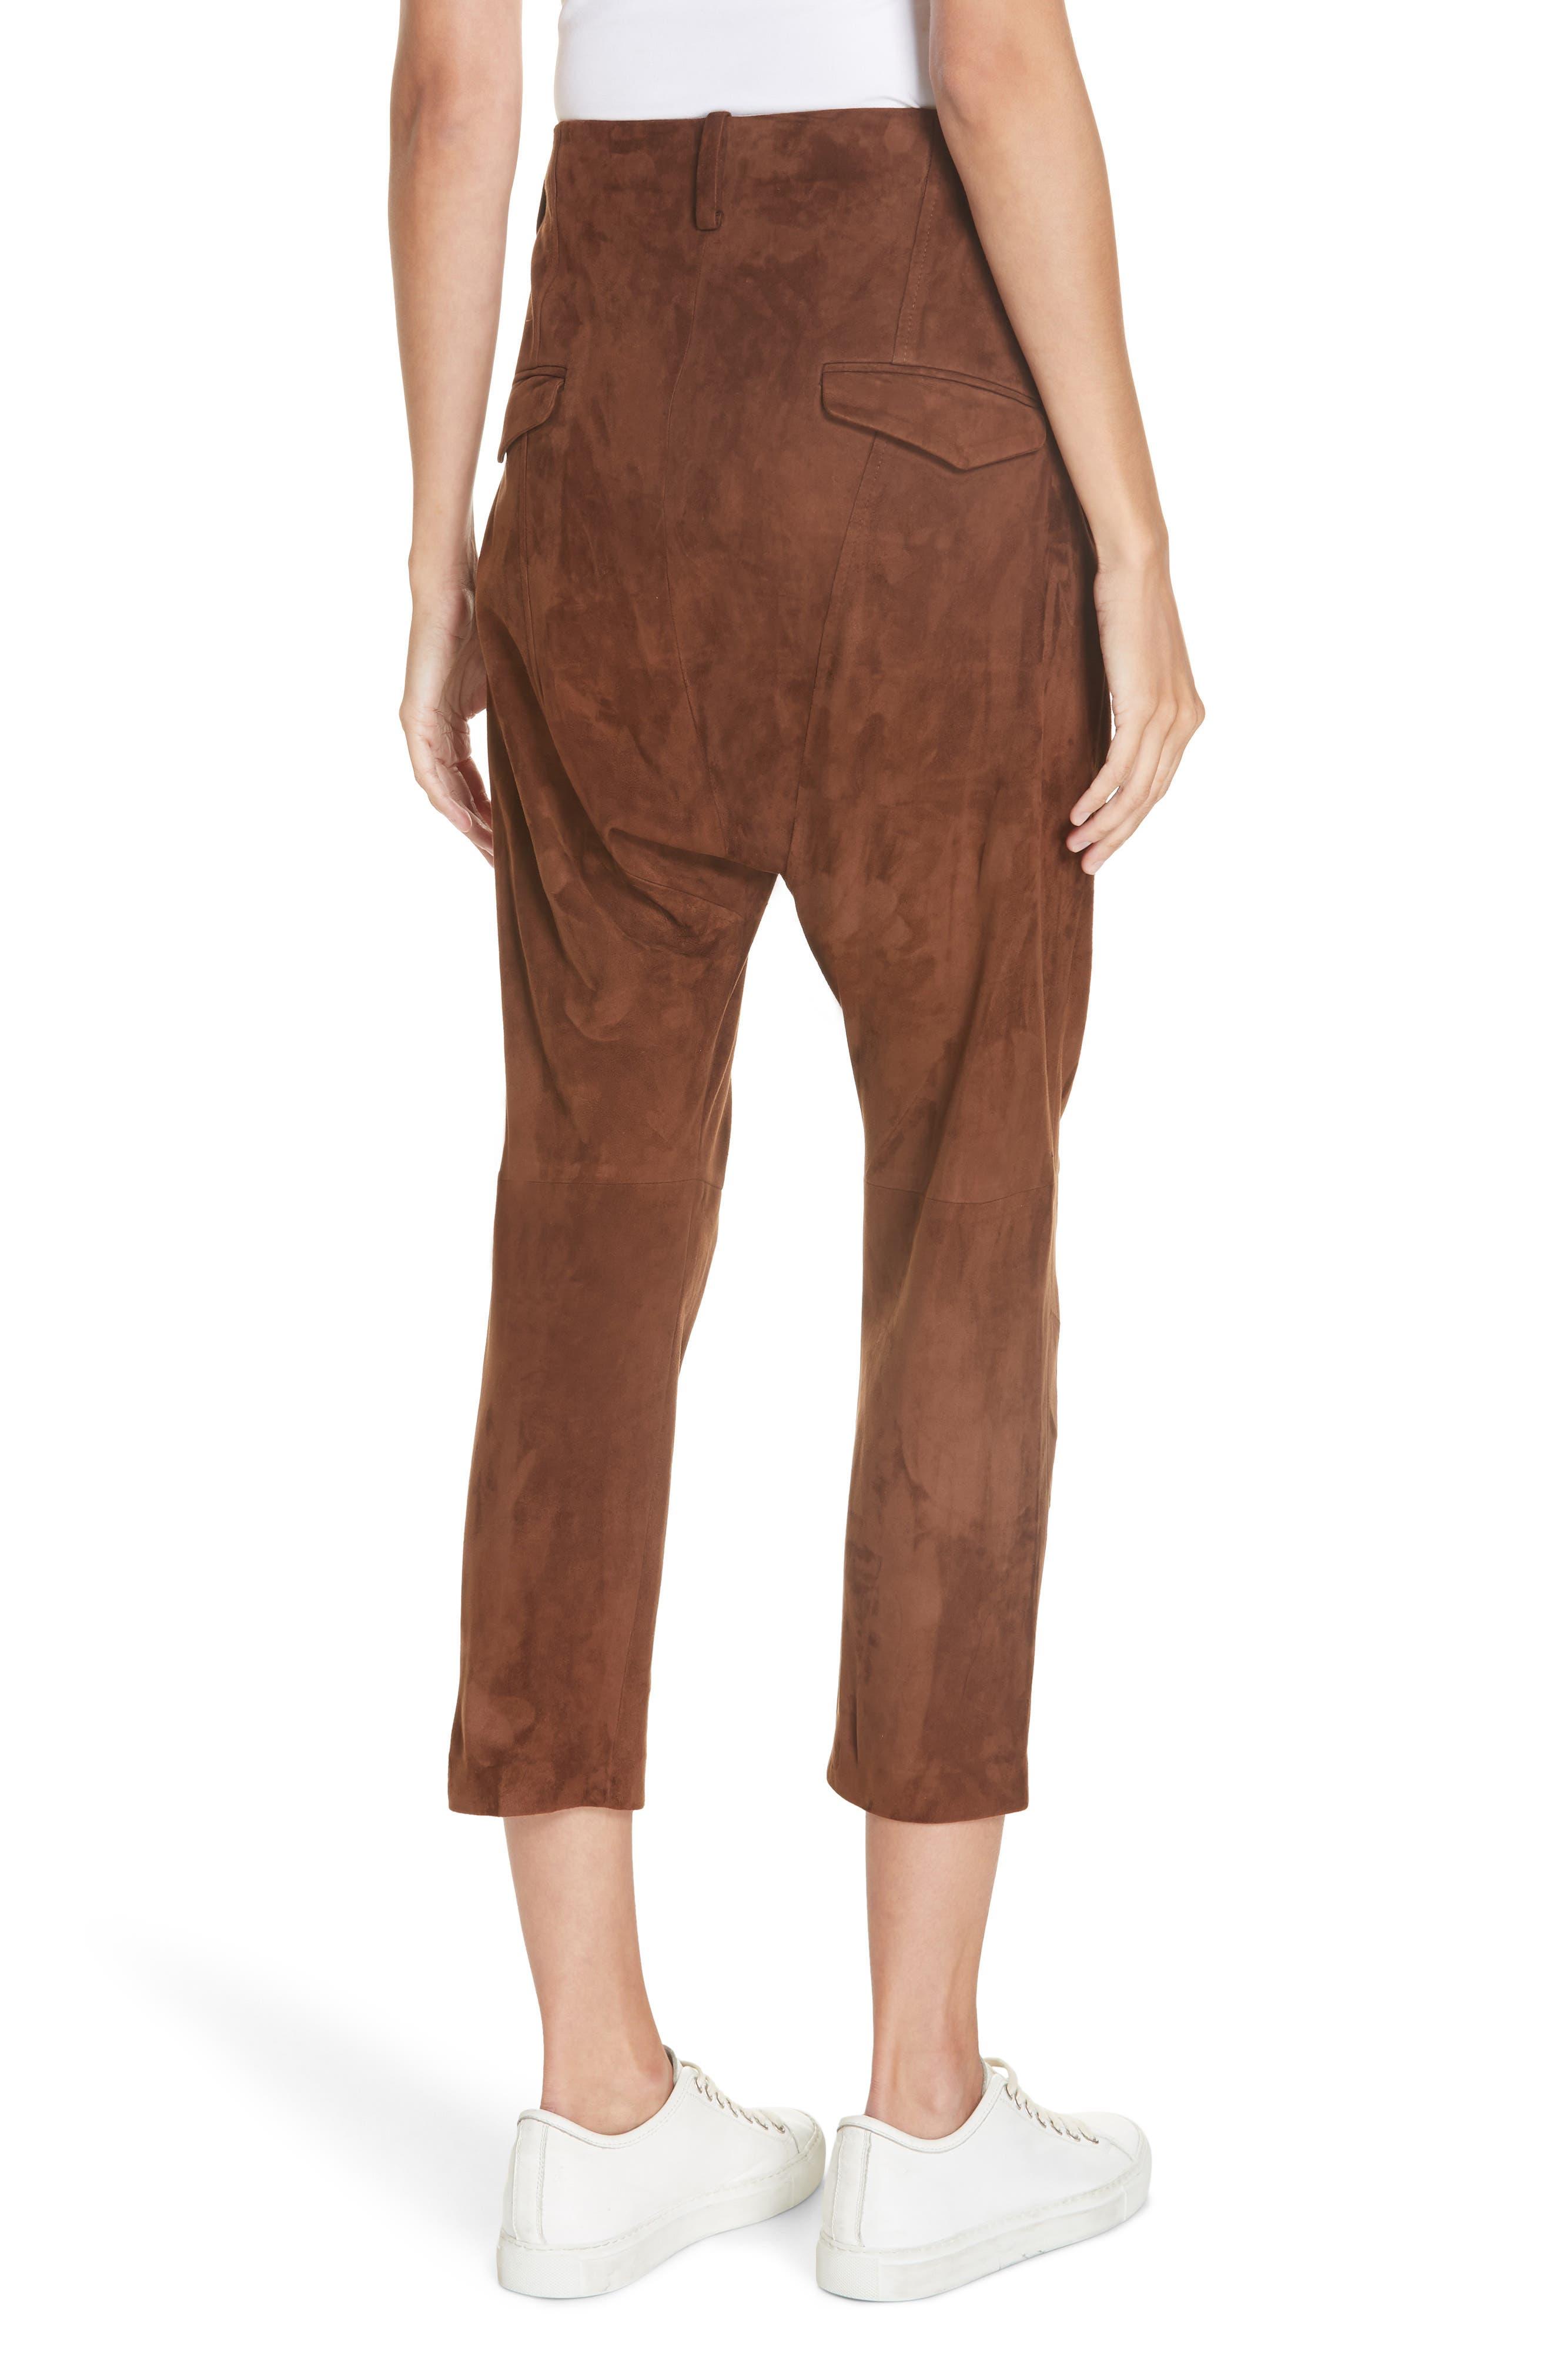 NILI LOTAN,                             Paris Leather Pants,                             Alternate thumbnail 2, color,                             DARK COGNAC